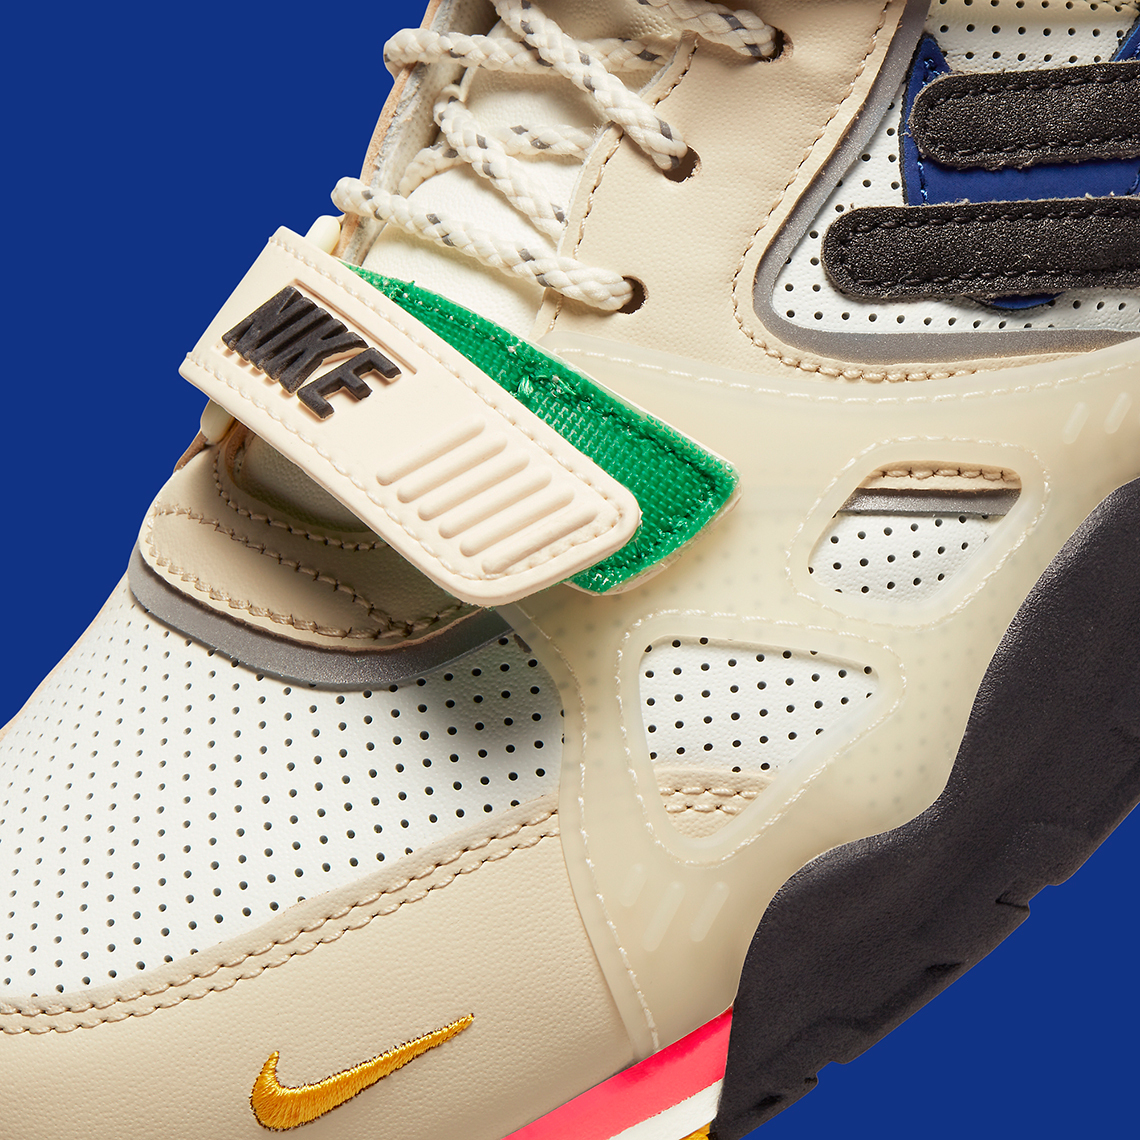 Nike Air Trainer 3 x Saquon Barkley